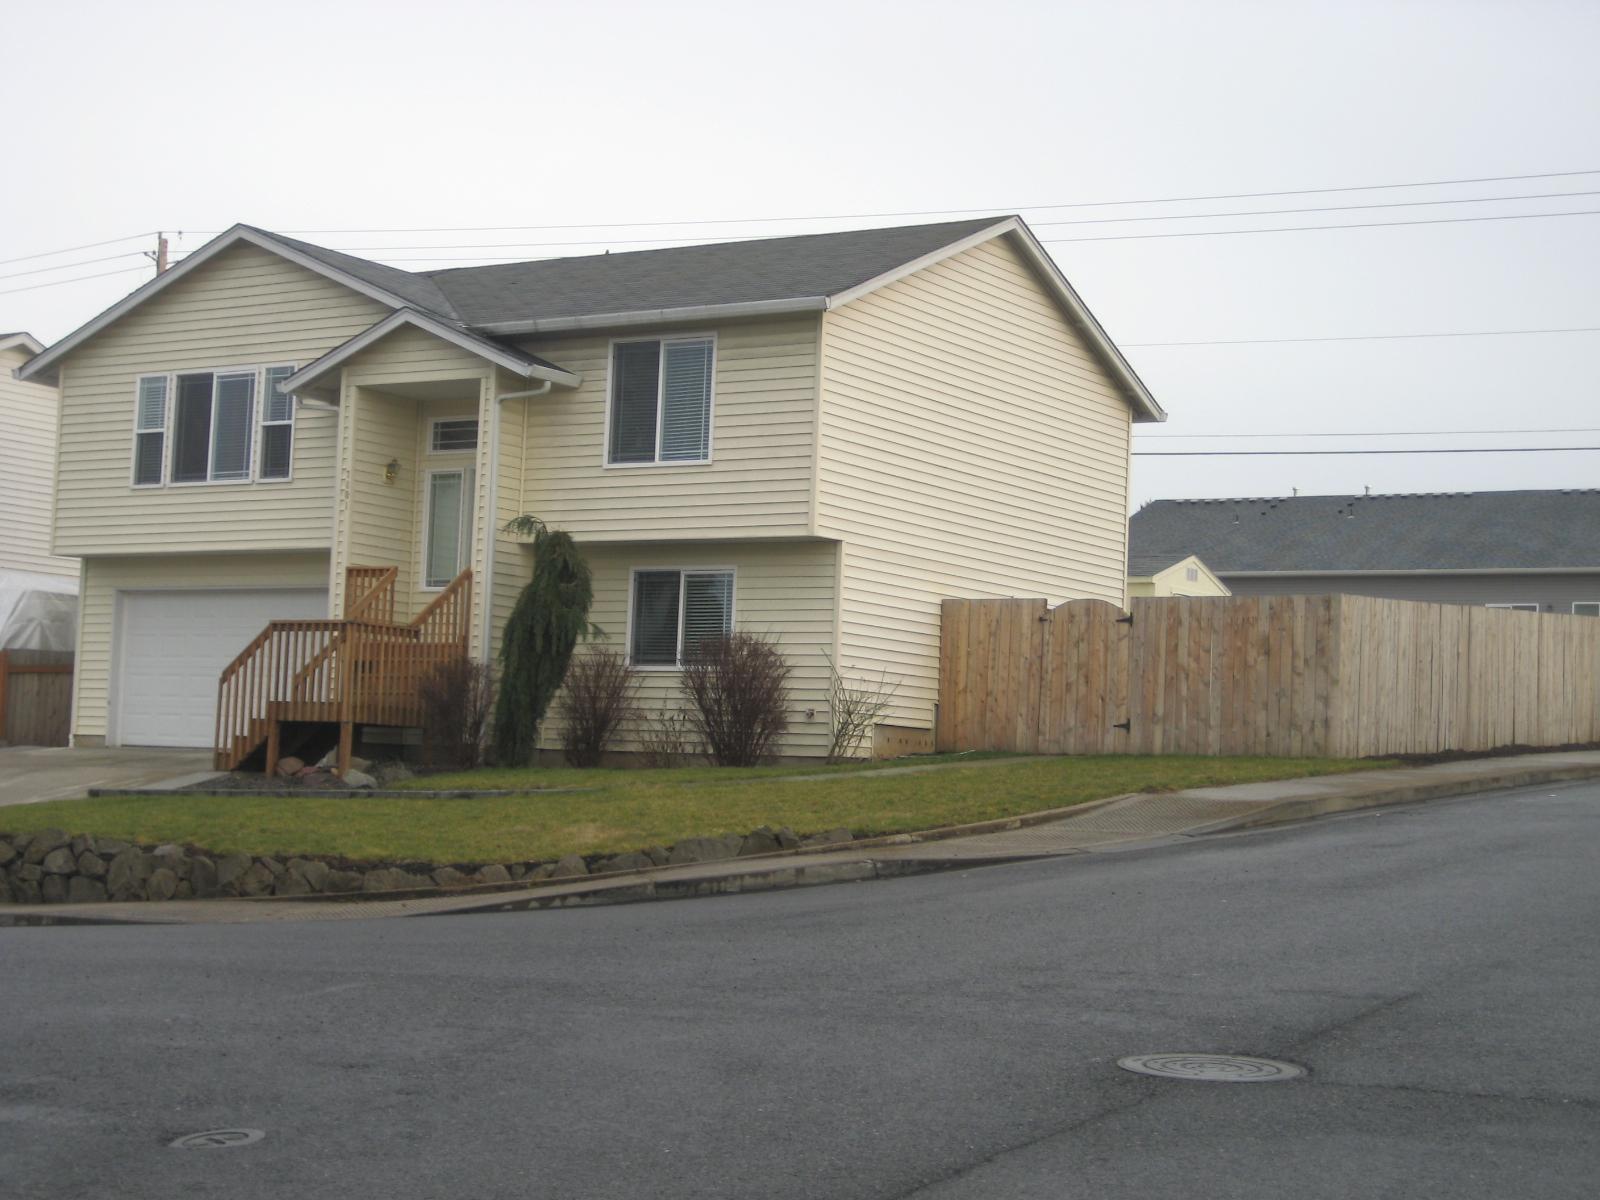 Rent a Home Vancouver WA Properties Torstang